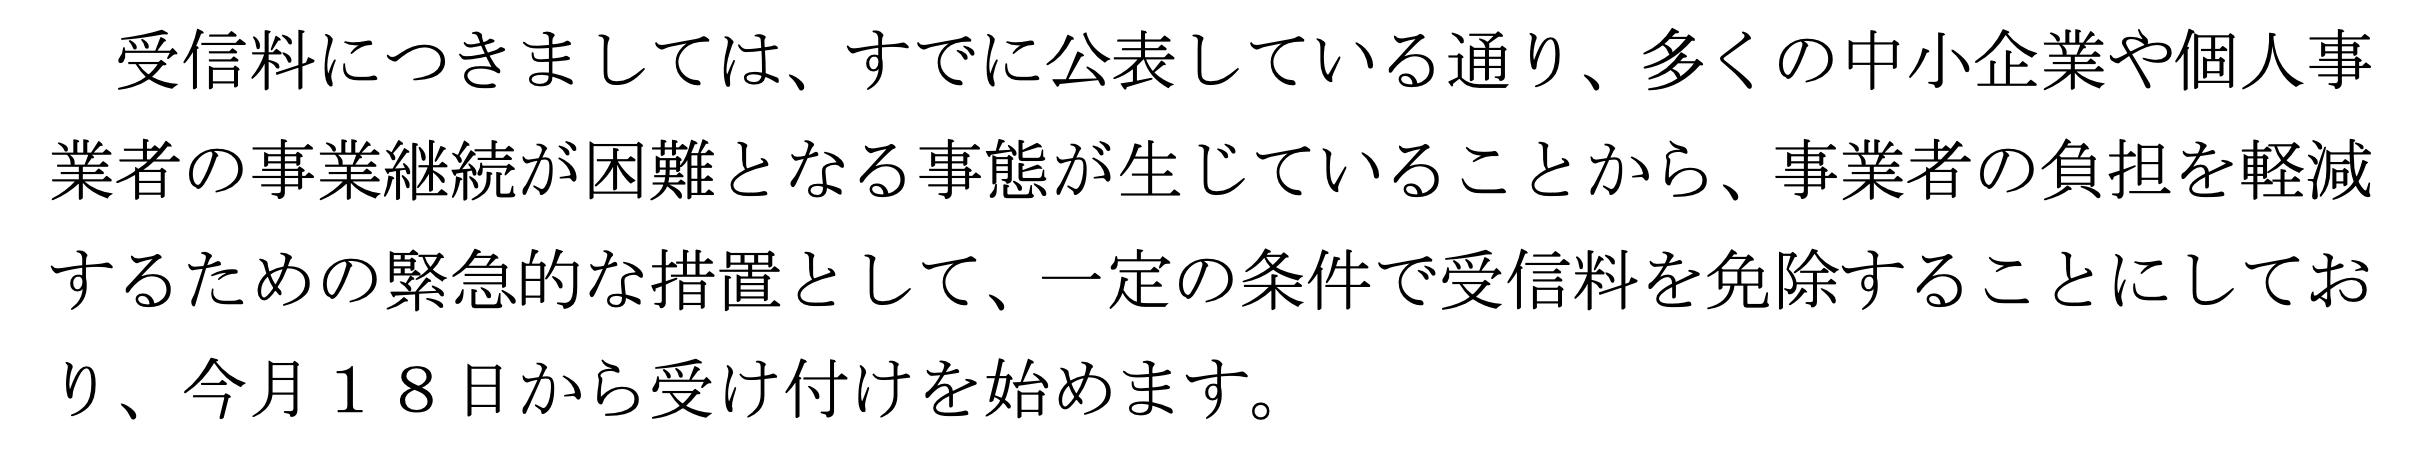 NHKコロナ受信料